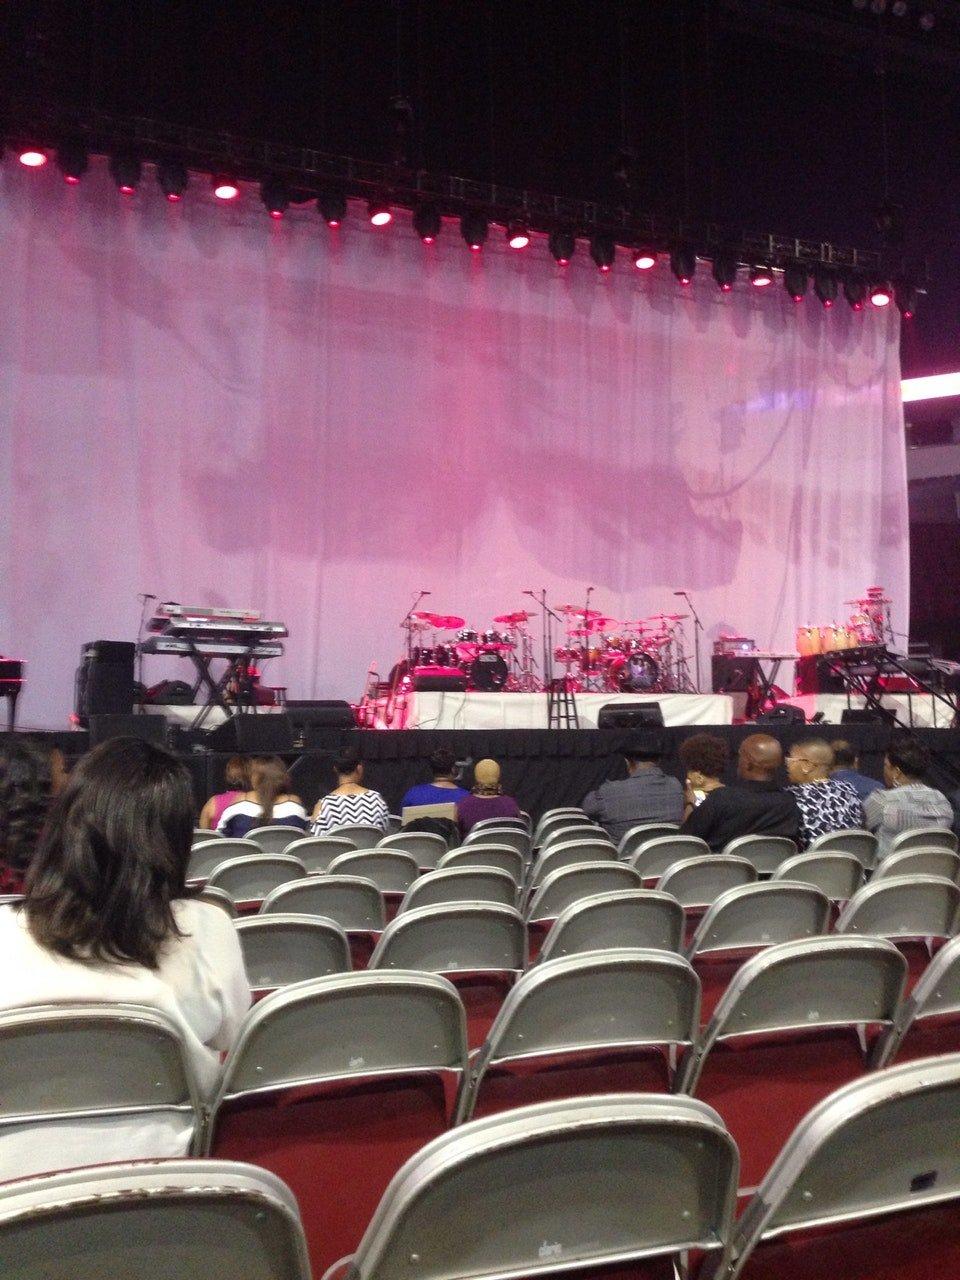 toyota center floor c concert seating